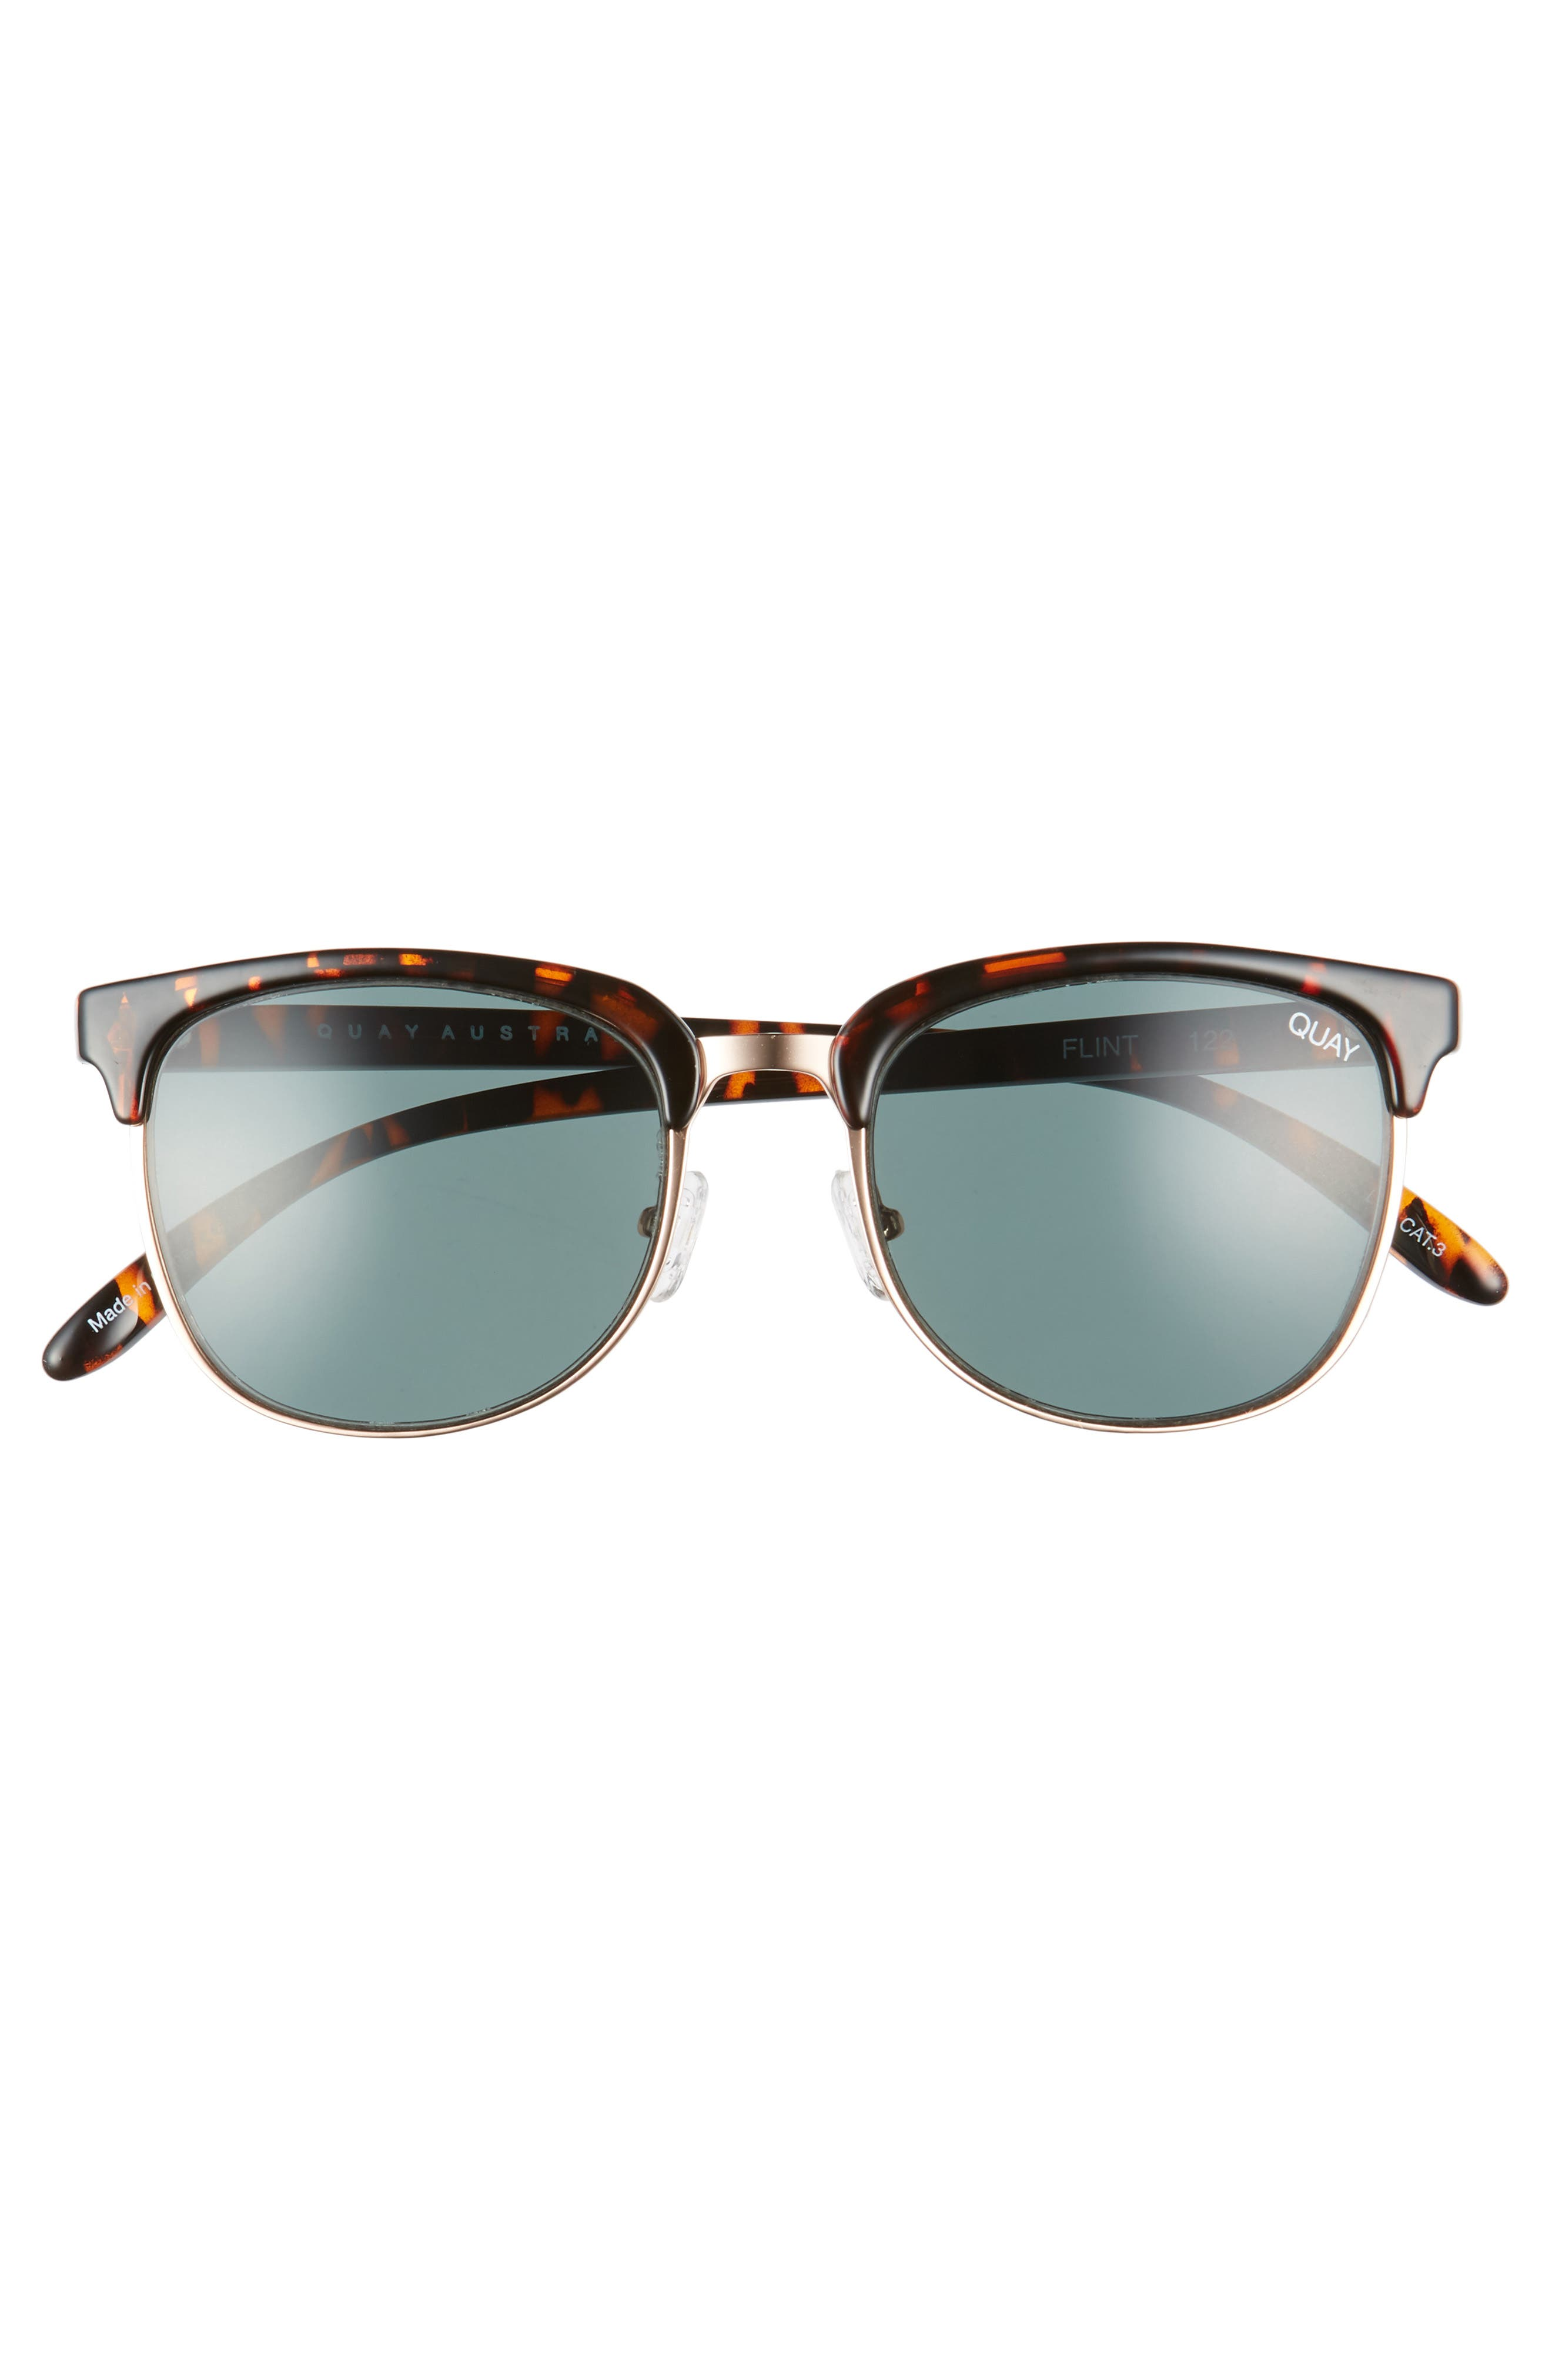 Flint 52mm Sunglasses,                             Alternate thumbnail 3, color,                             200